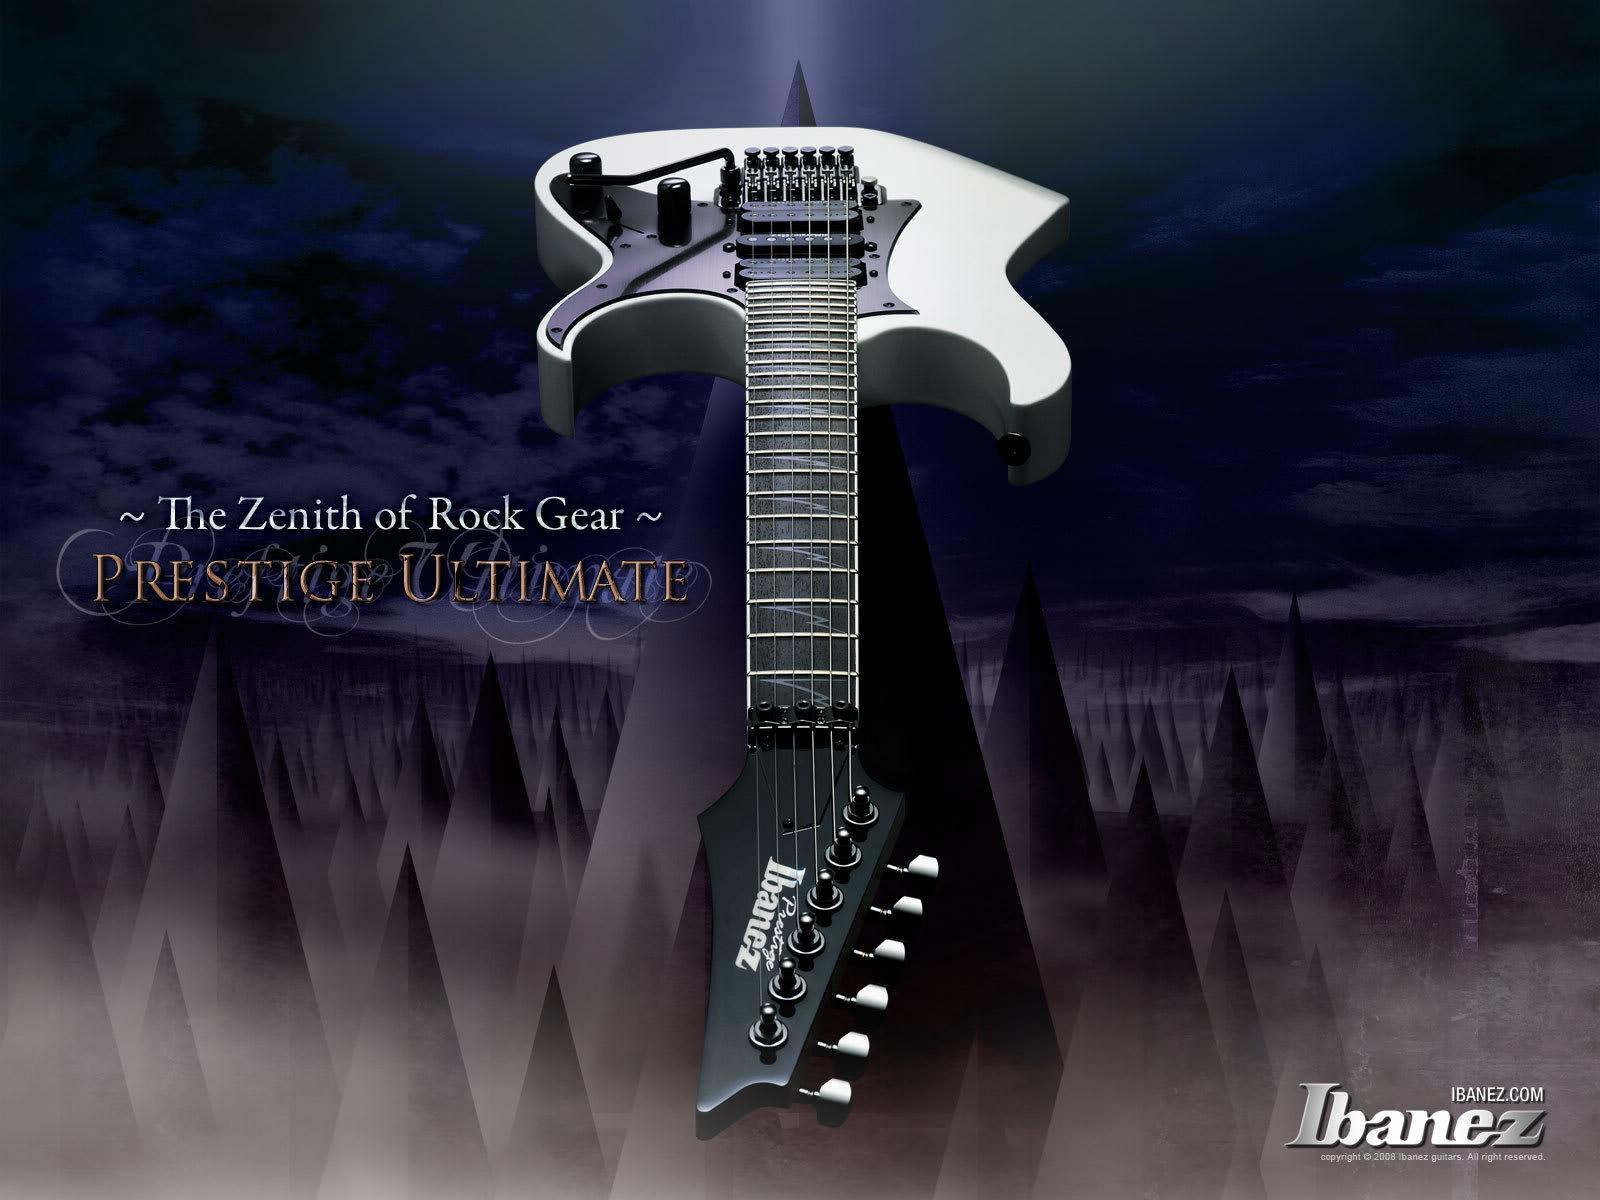 Guitar Ibanez Wallpaper 16506 Hd Wallpapers in Music   Imagescicom 1600x1200